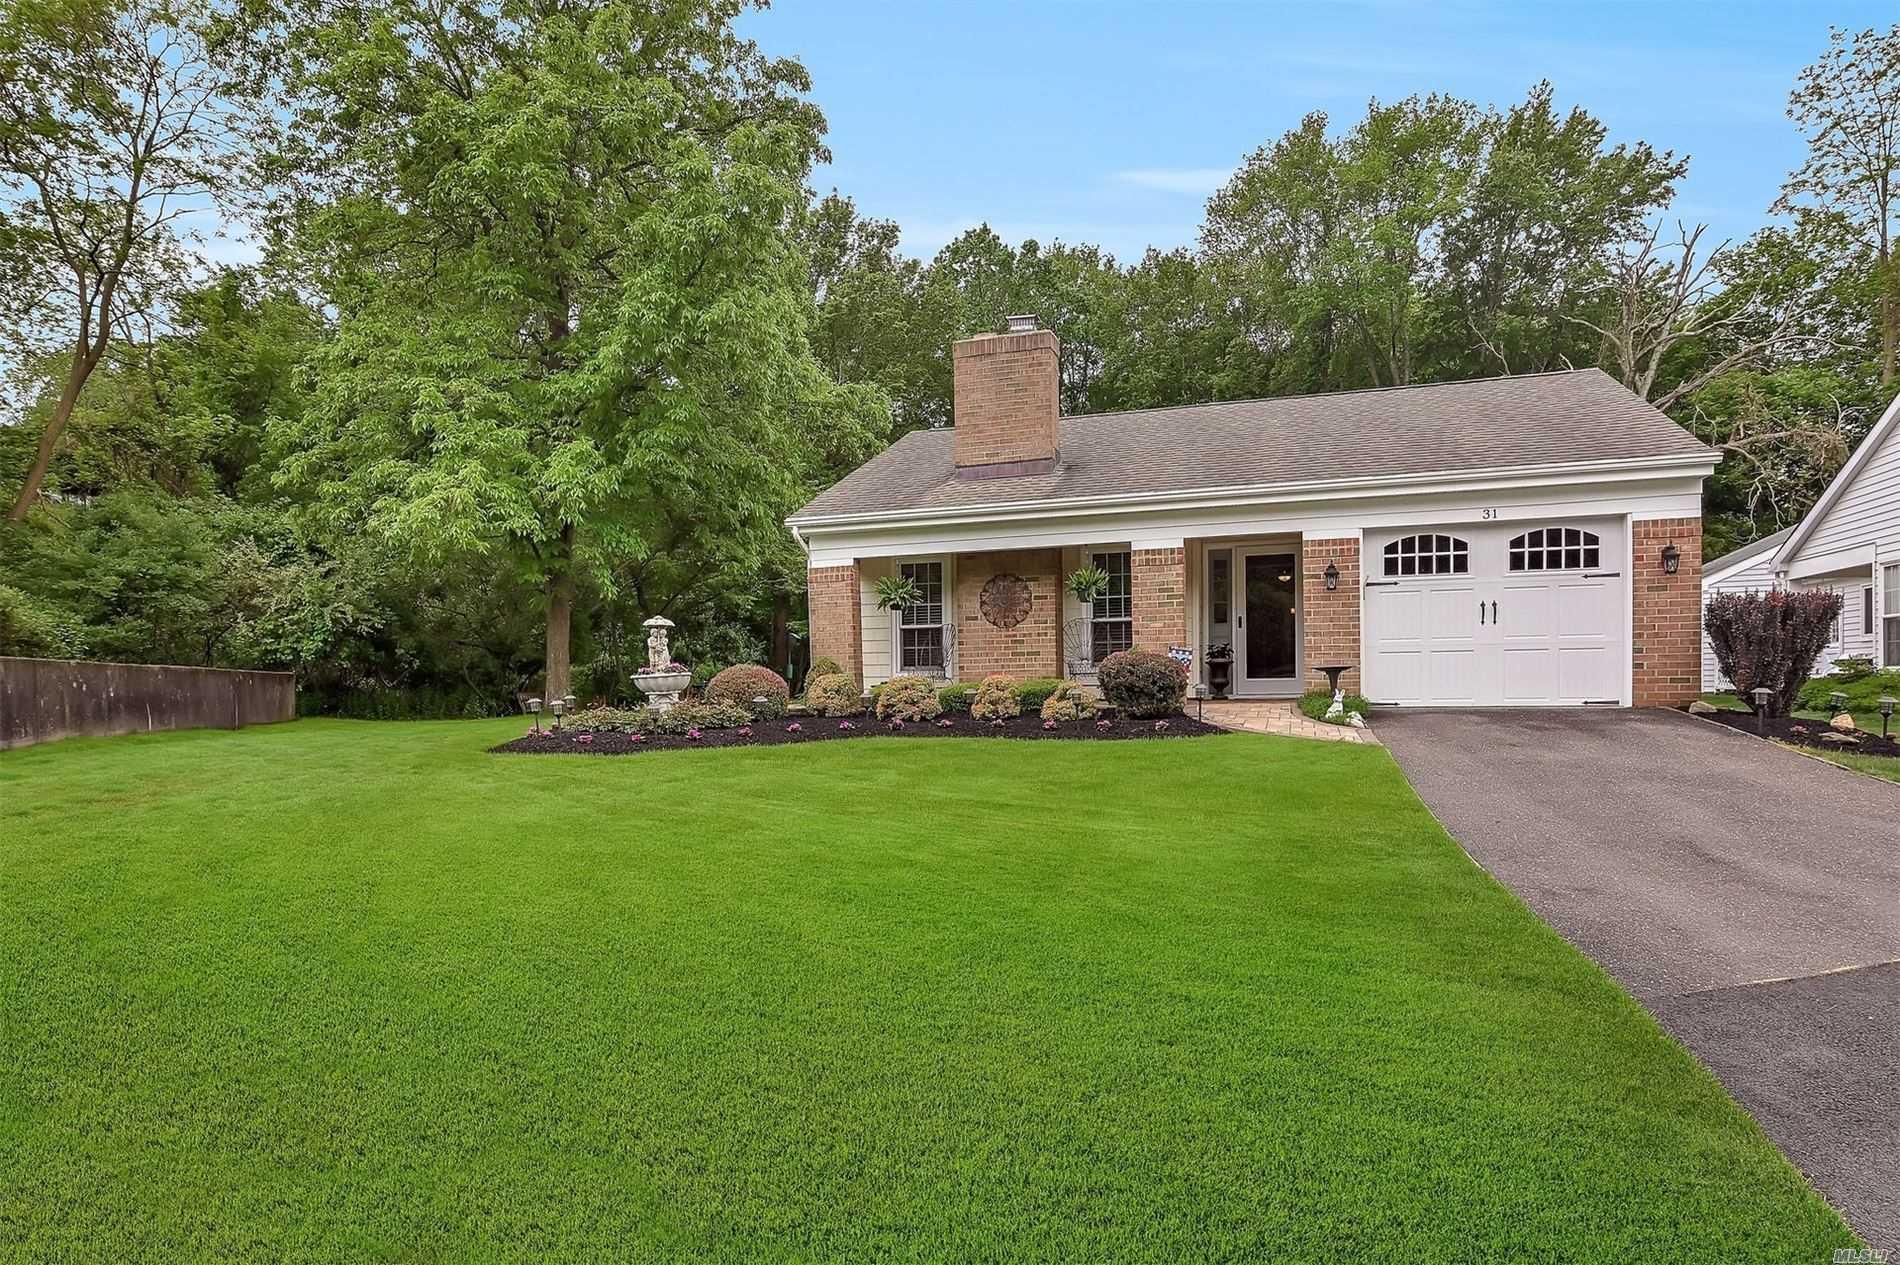 Property for sale at 31 Lamont Road, Ridge NY 11961, Ridge,  New York 11961